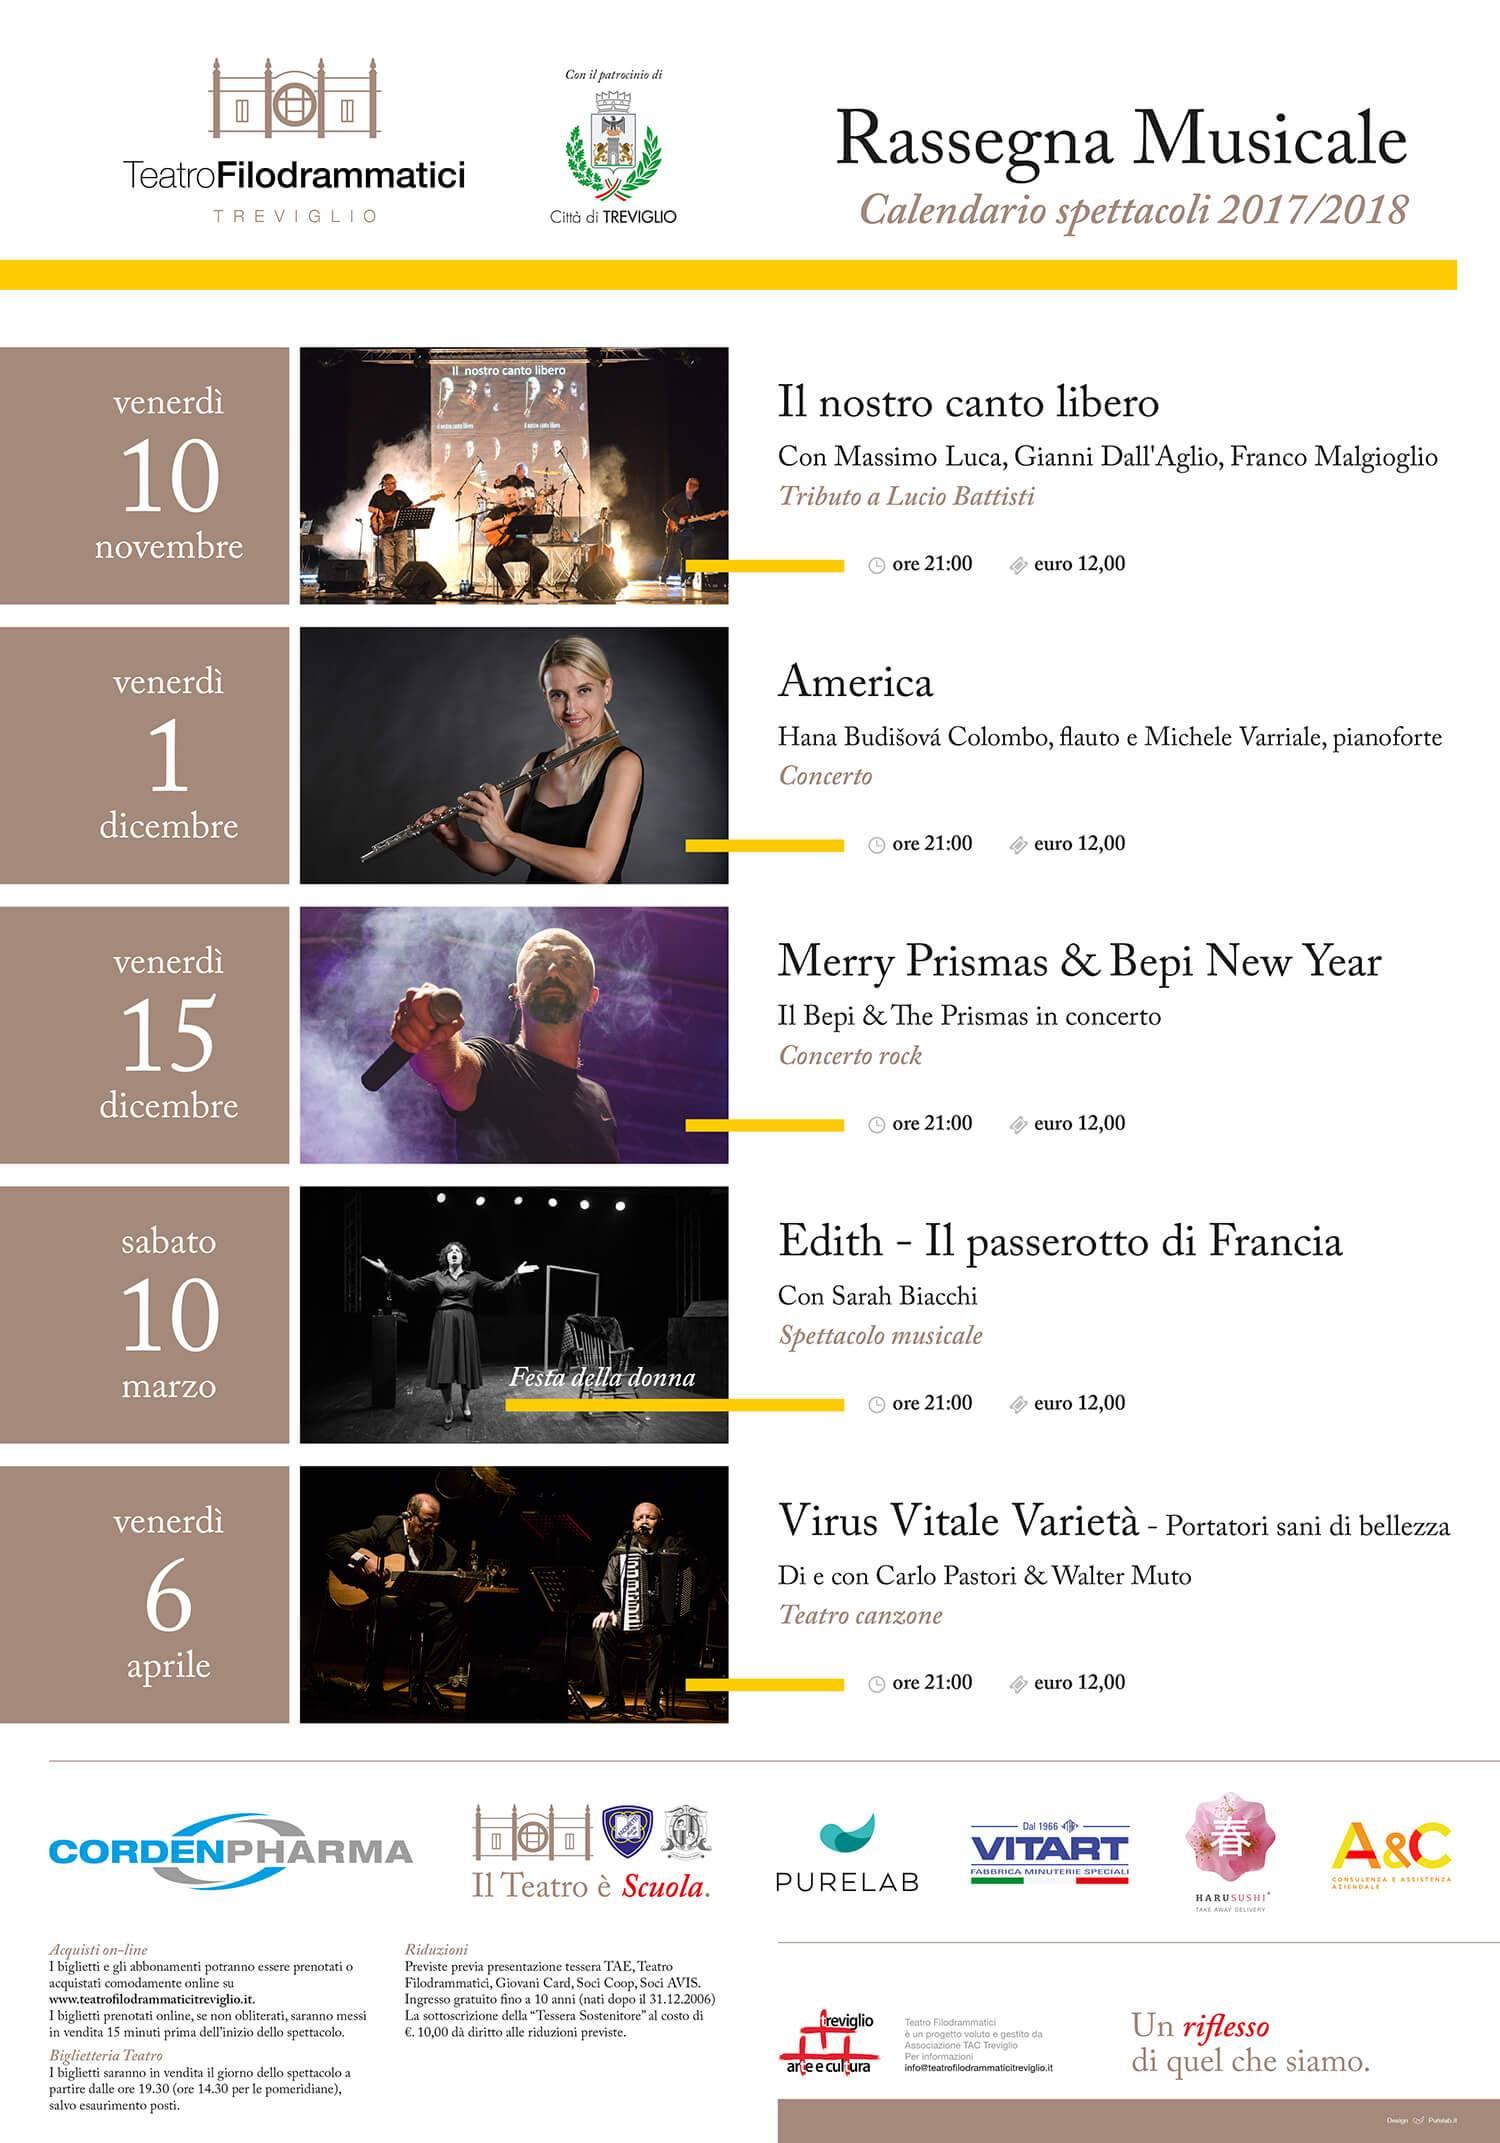 tft_rassegna_musicale_17_18